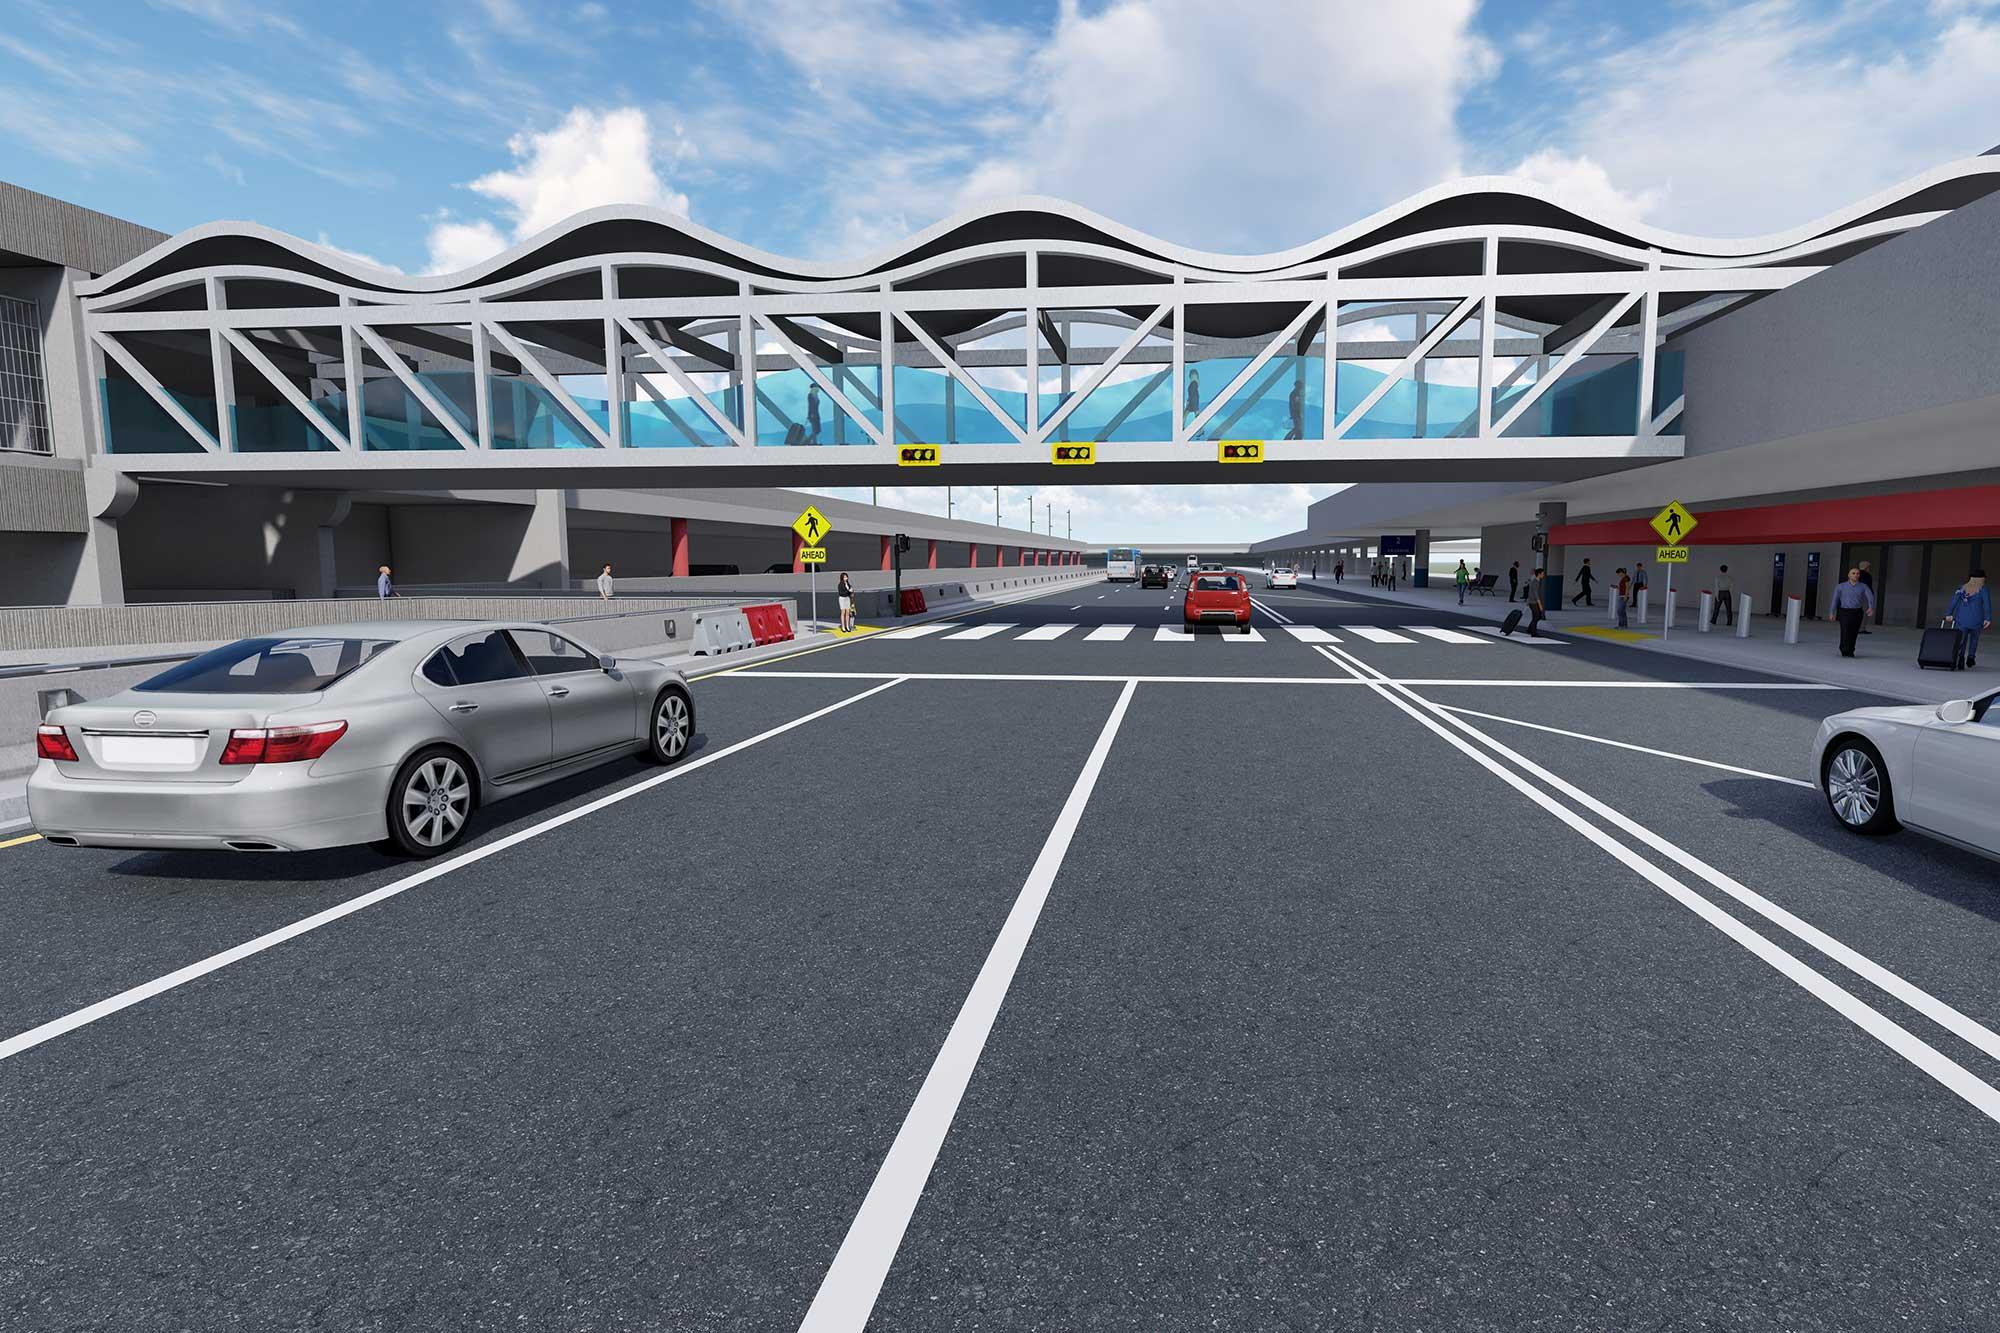 Airport Cross Walk Signalization Lighting & Technology Improvements